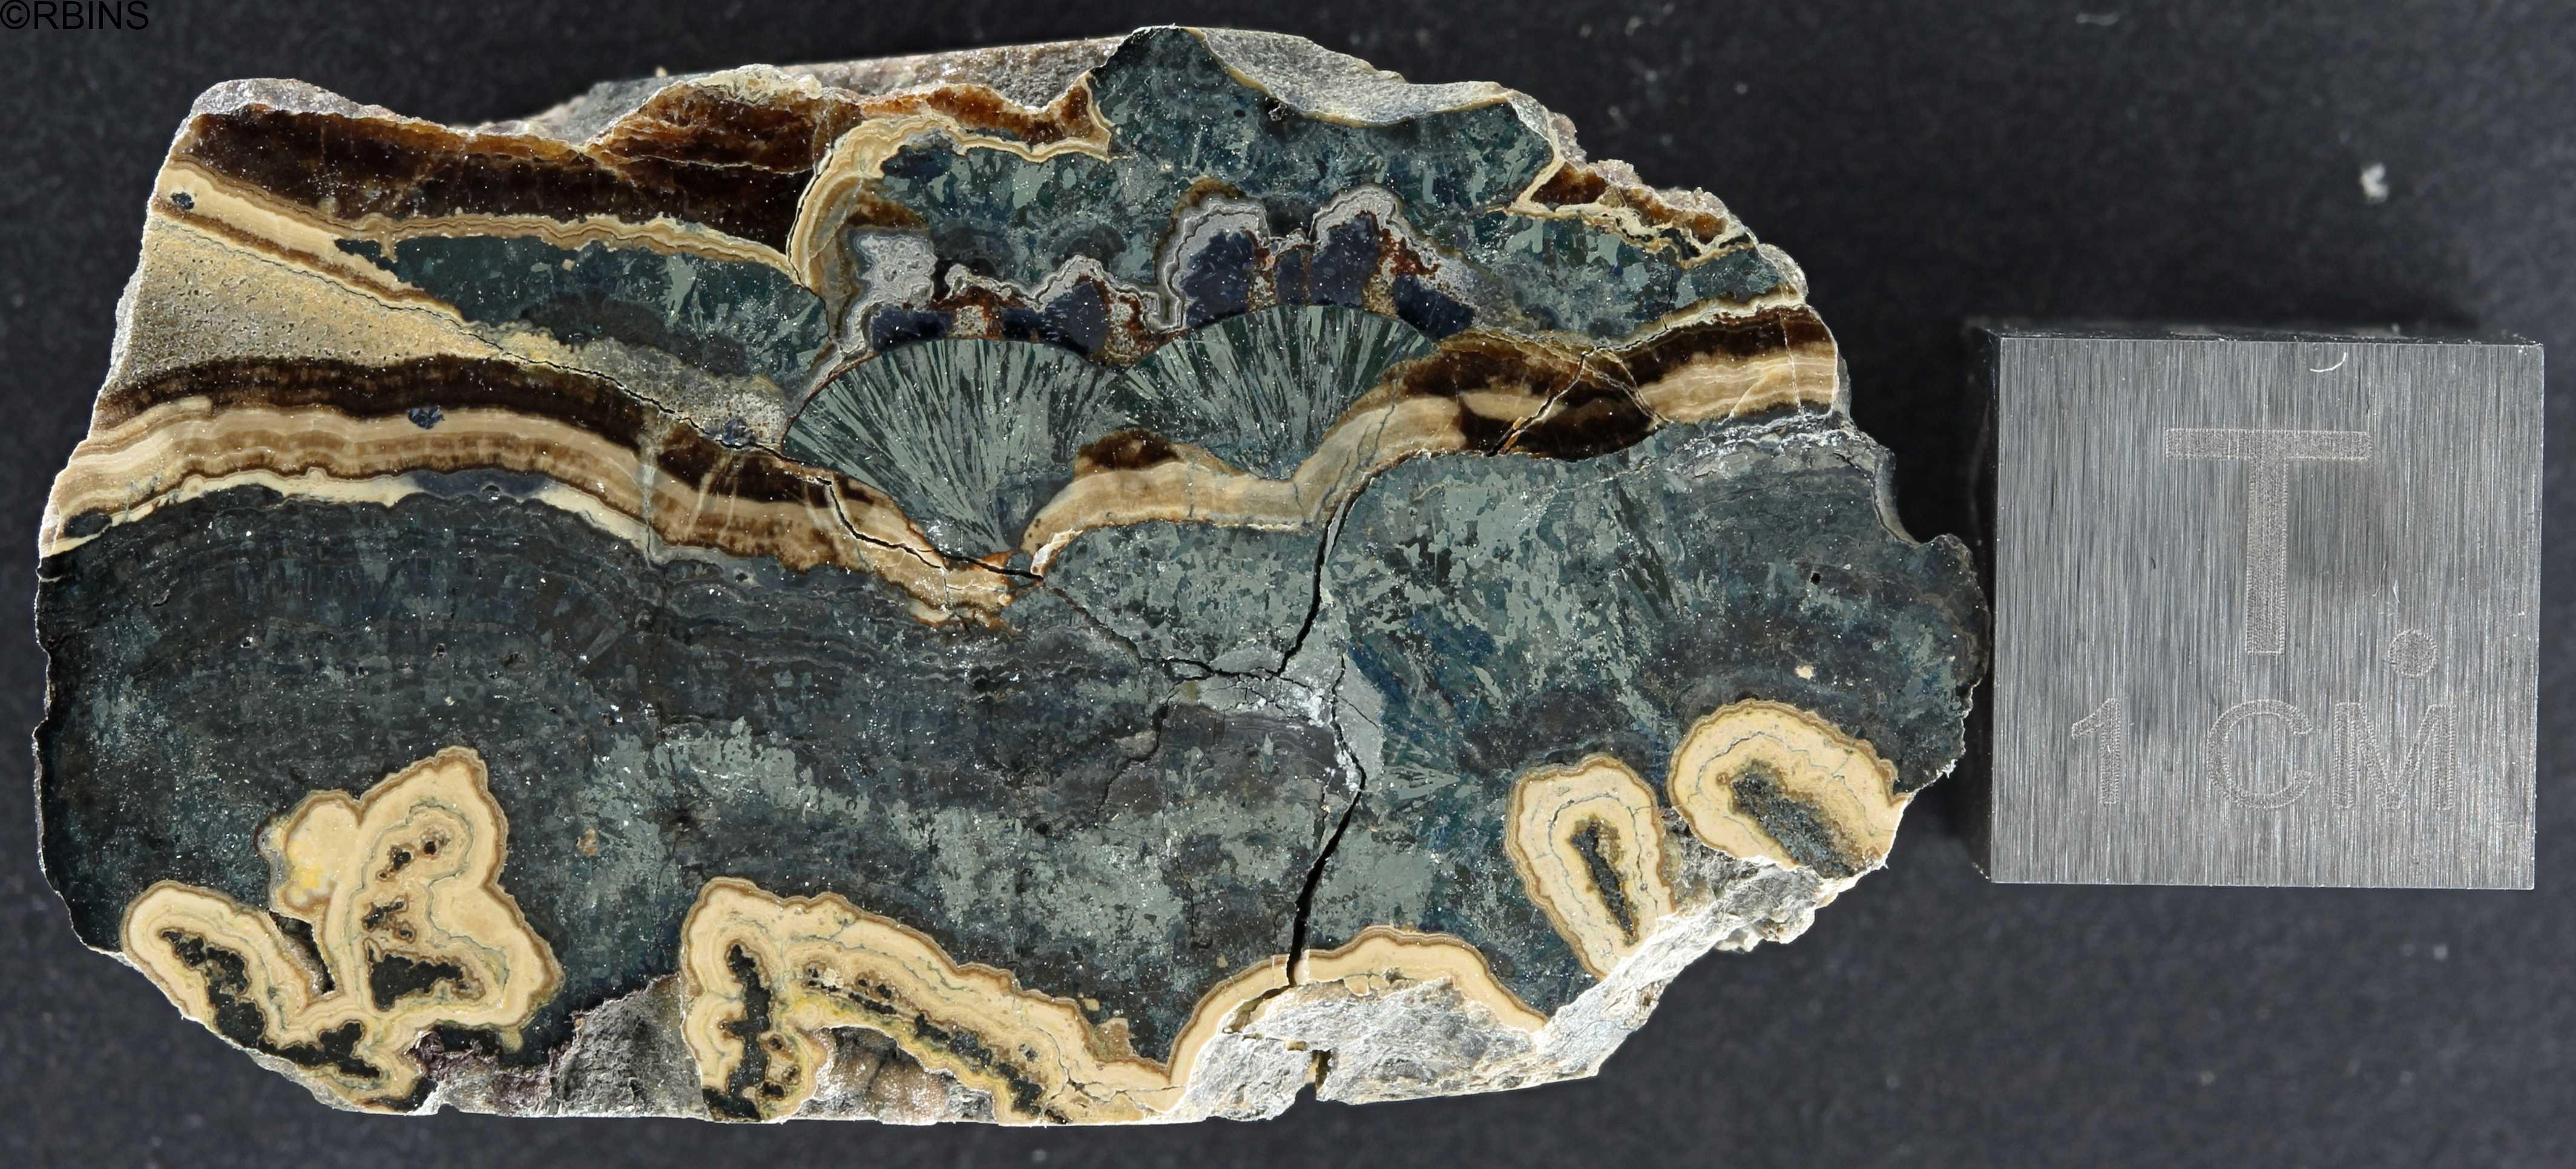 rn6380-holotype-zs-pmax_dxo_lowq.jpg